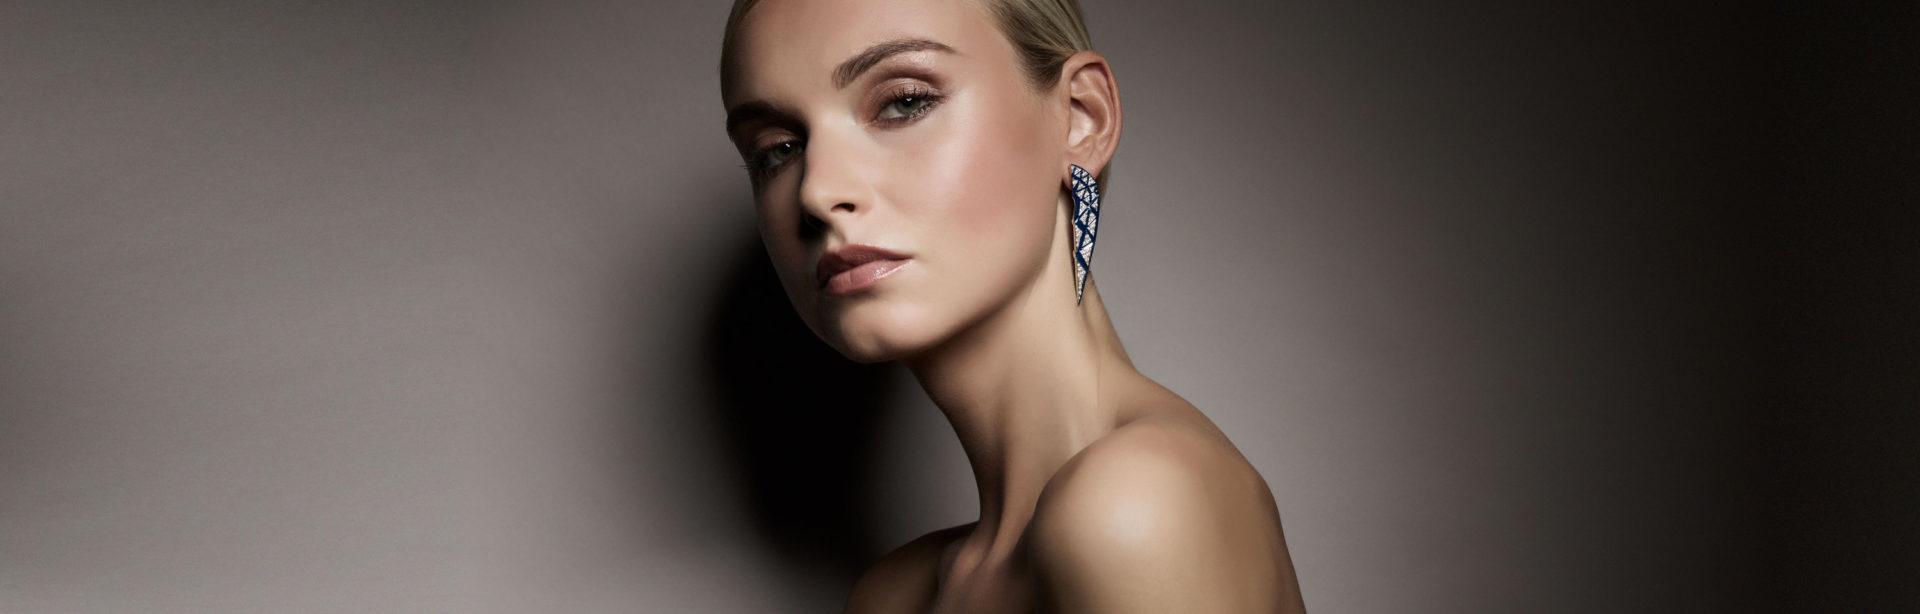 Prestige magazine, Prestige, magazine, juwelen, lifestyle, horloges, horlogerie, juwelenbranche